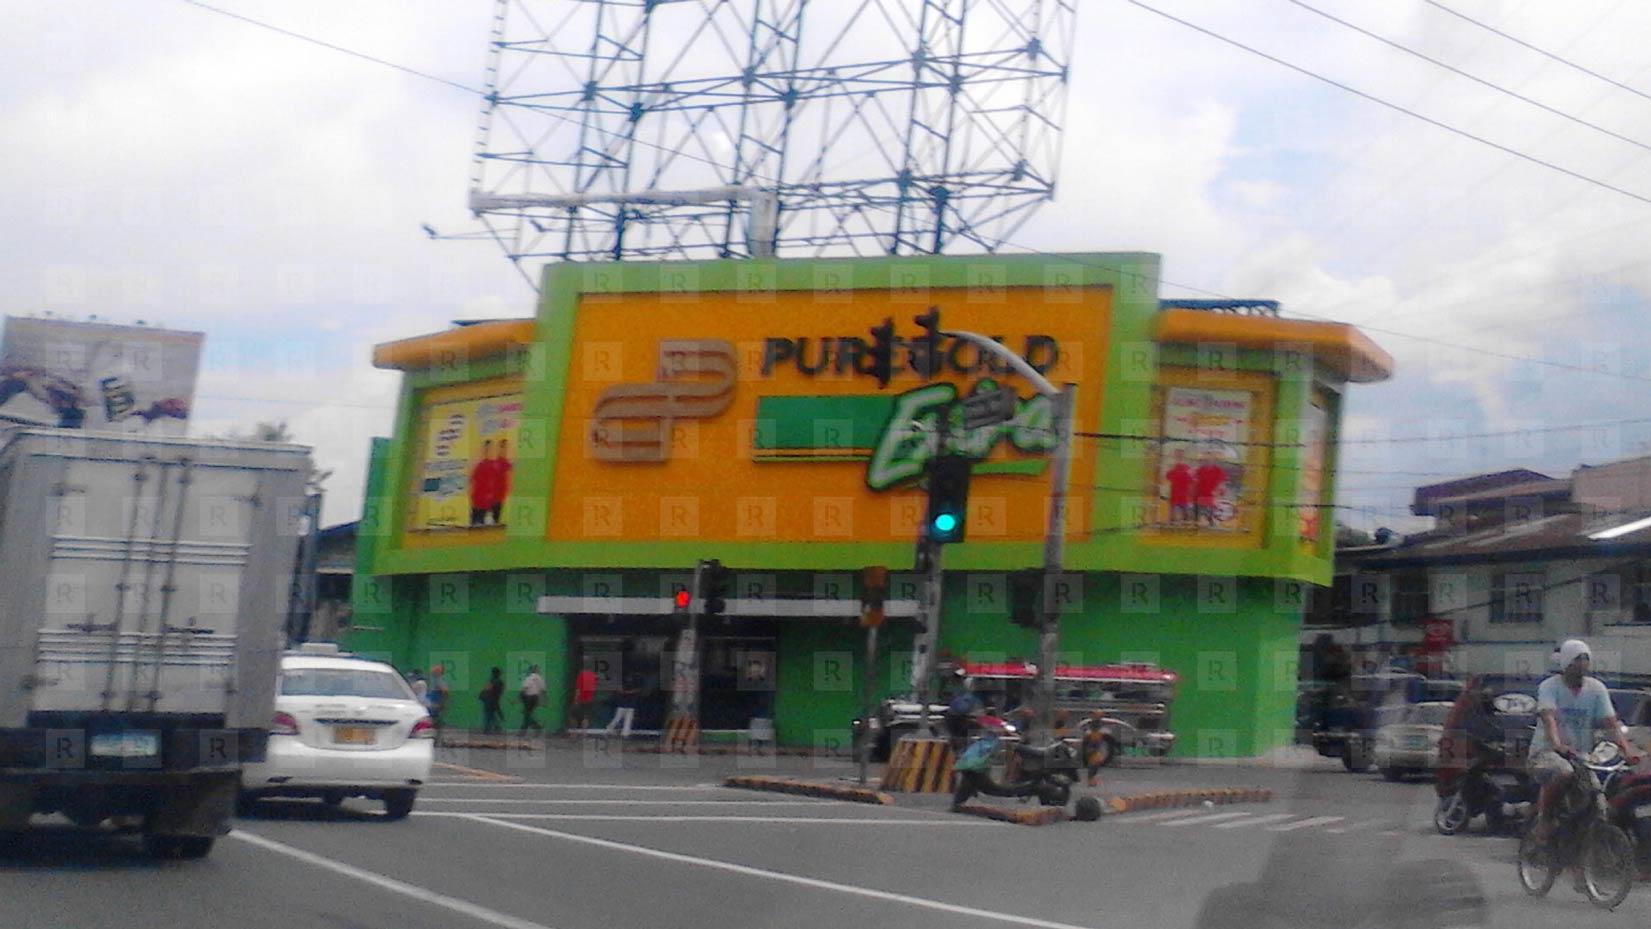 Puregold Extra Store Logo